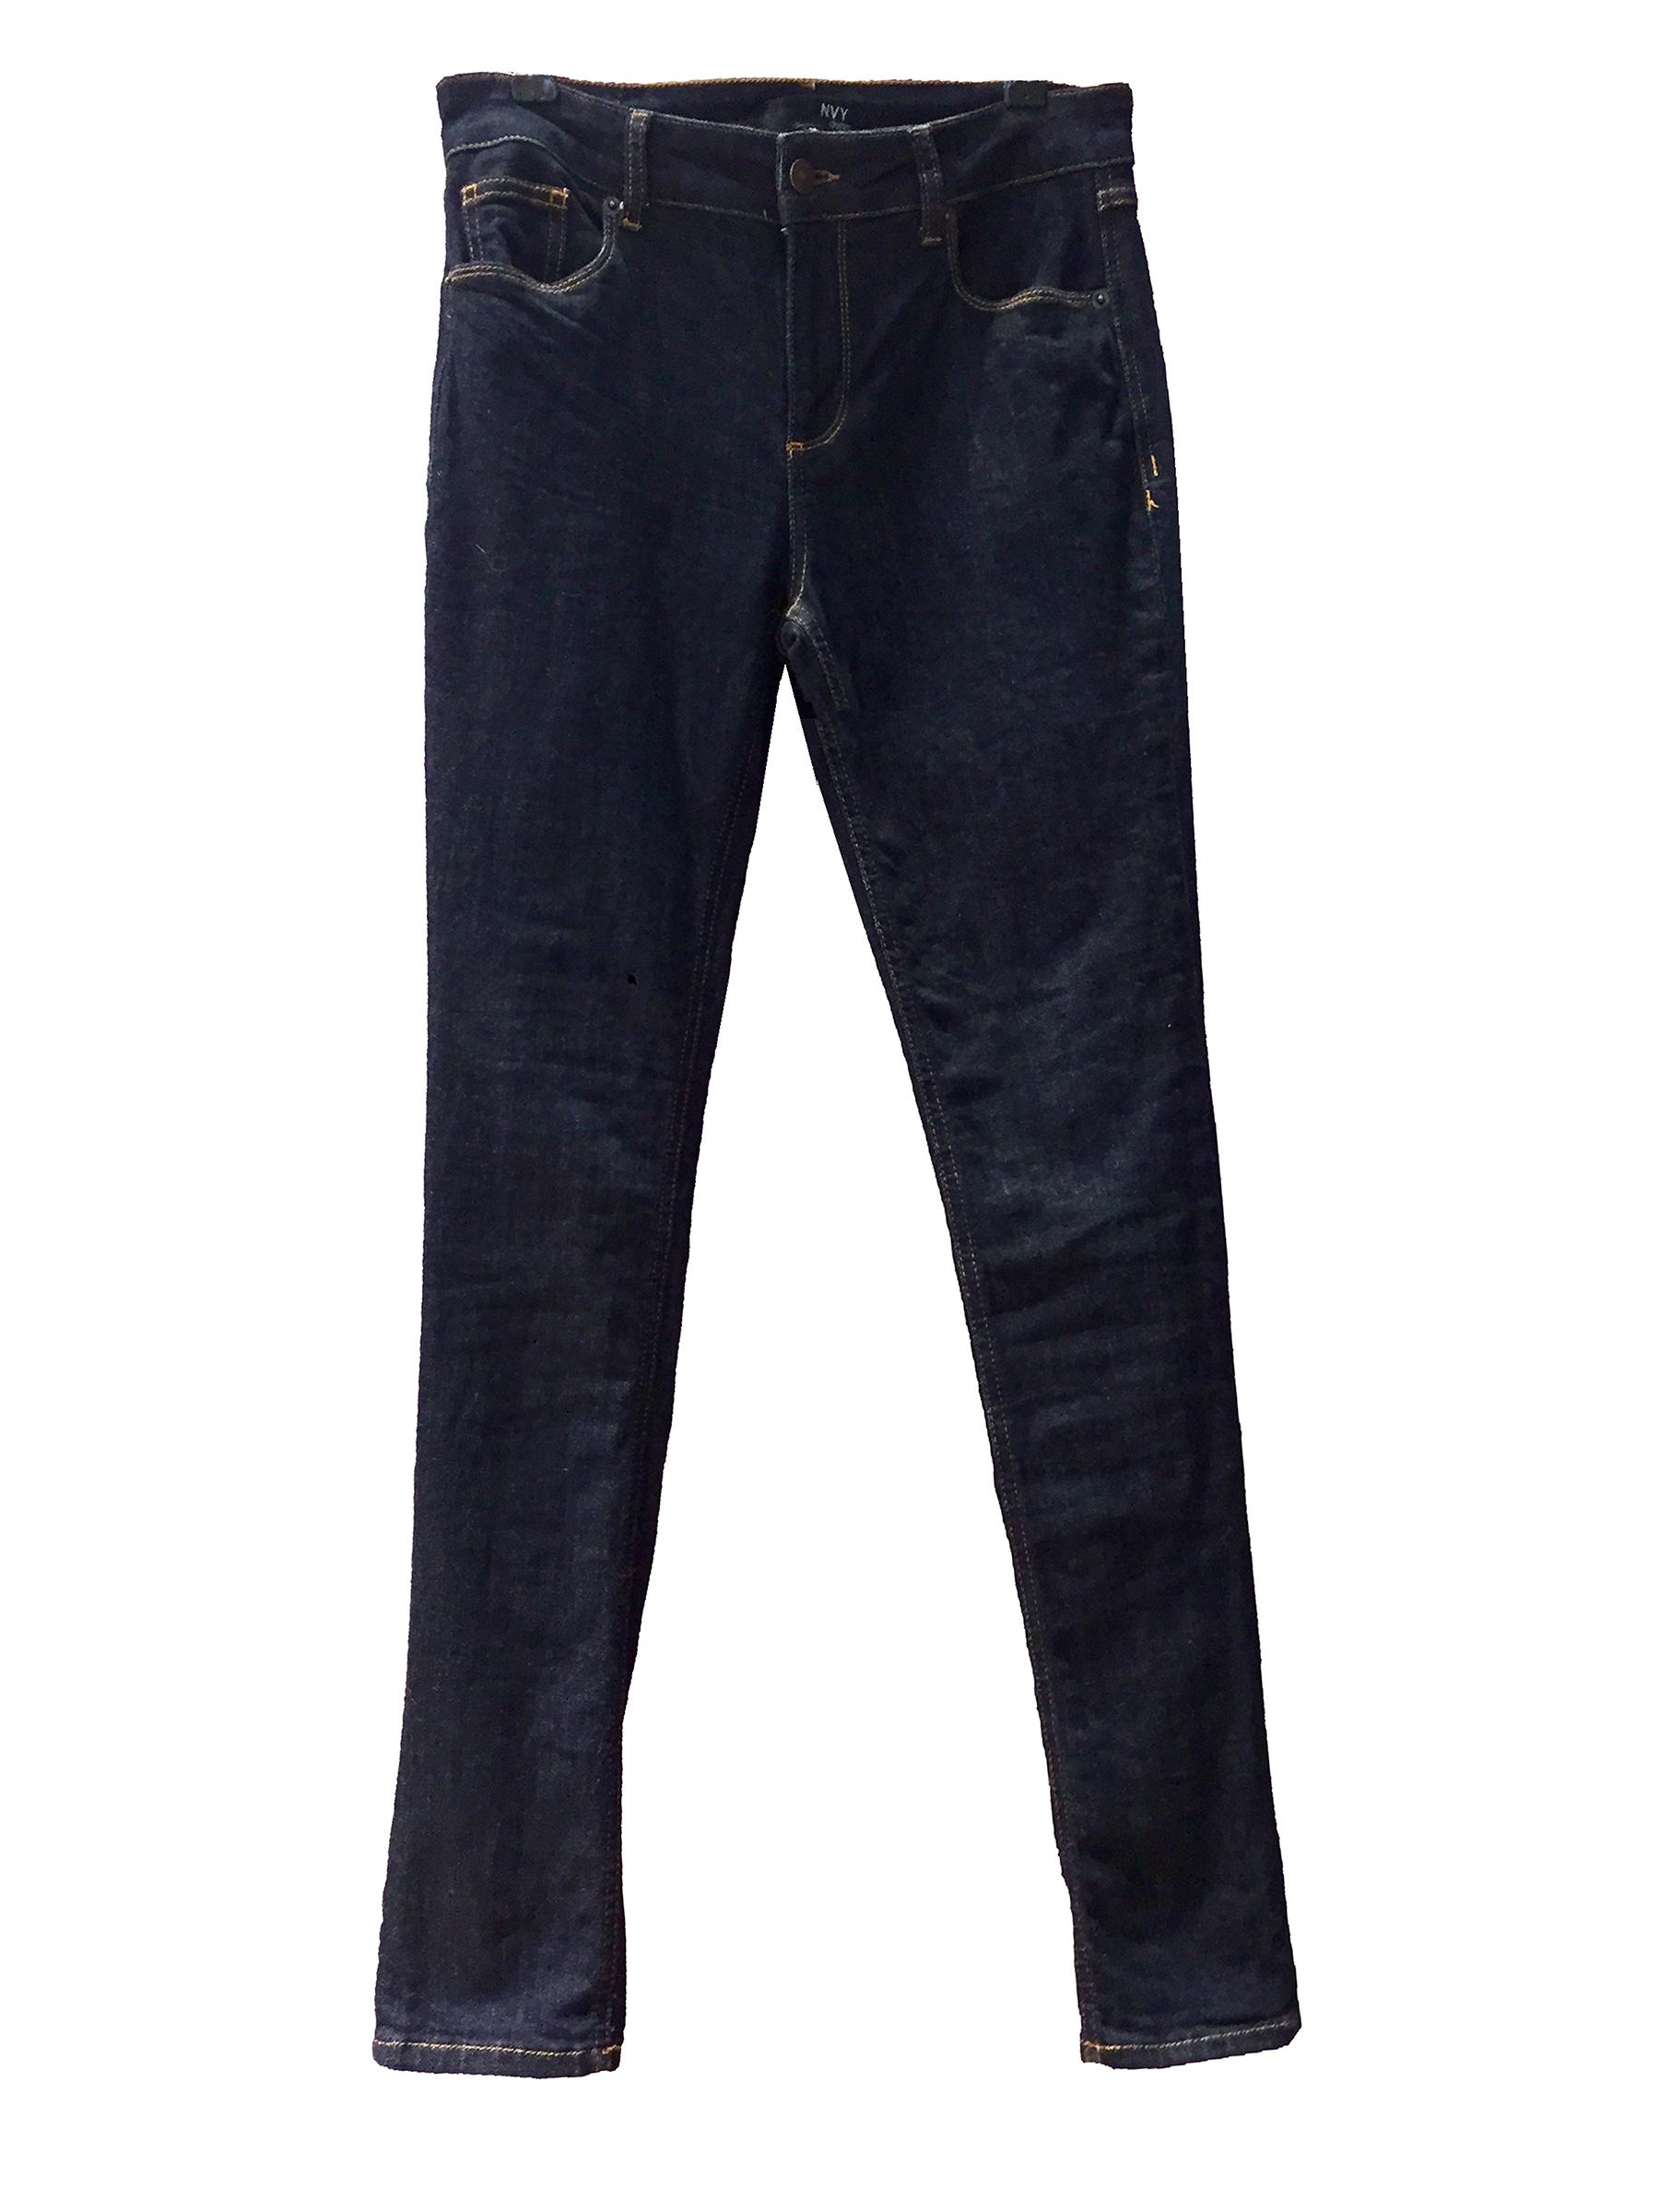 Pantalon jean délavé